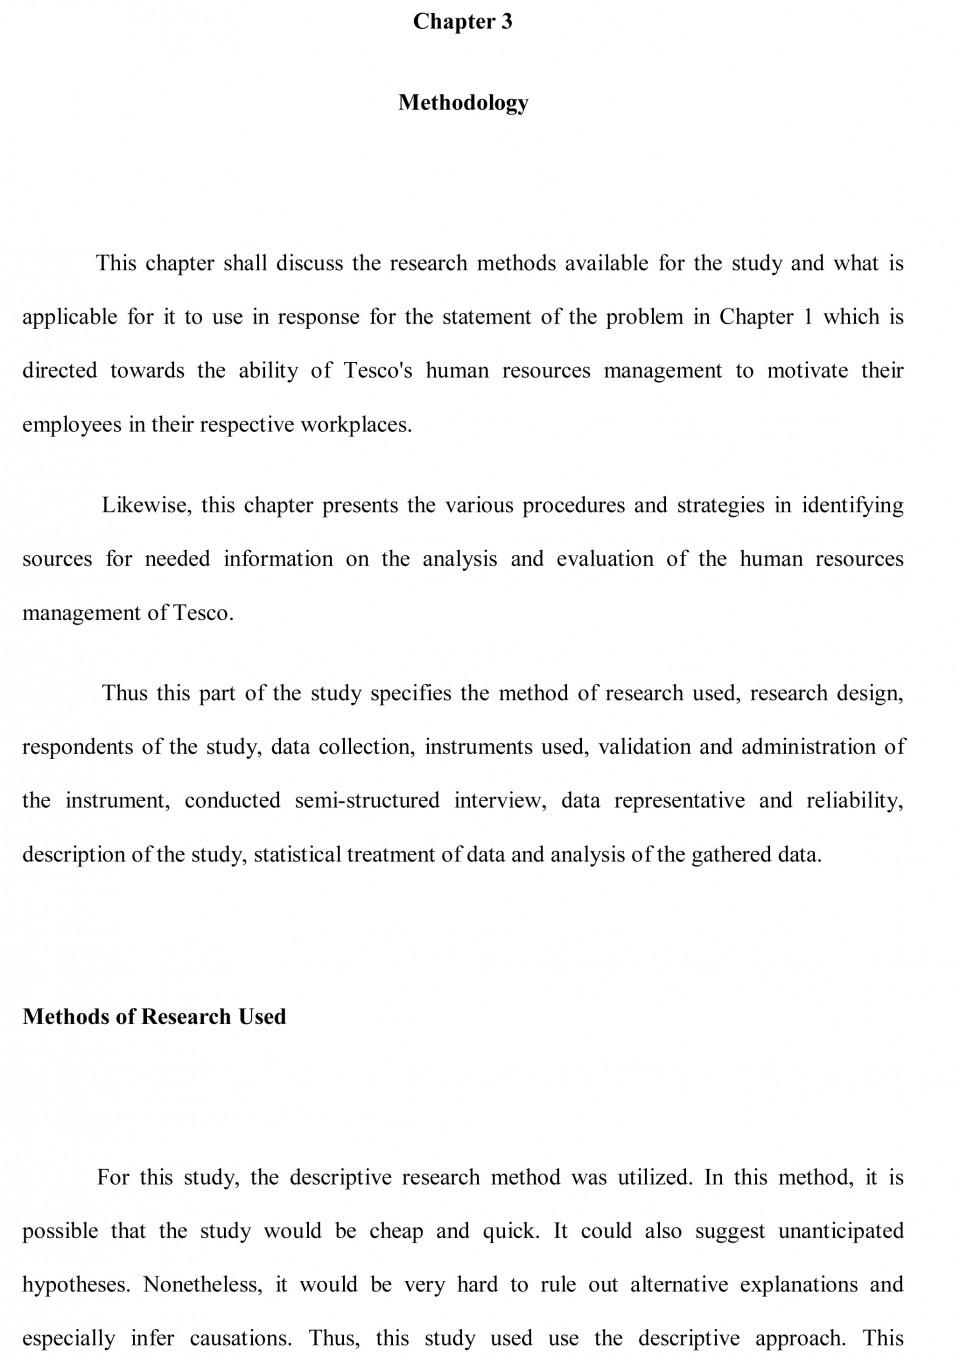 Professional descriptive essay writer service for school